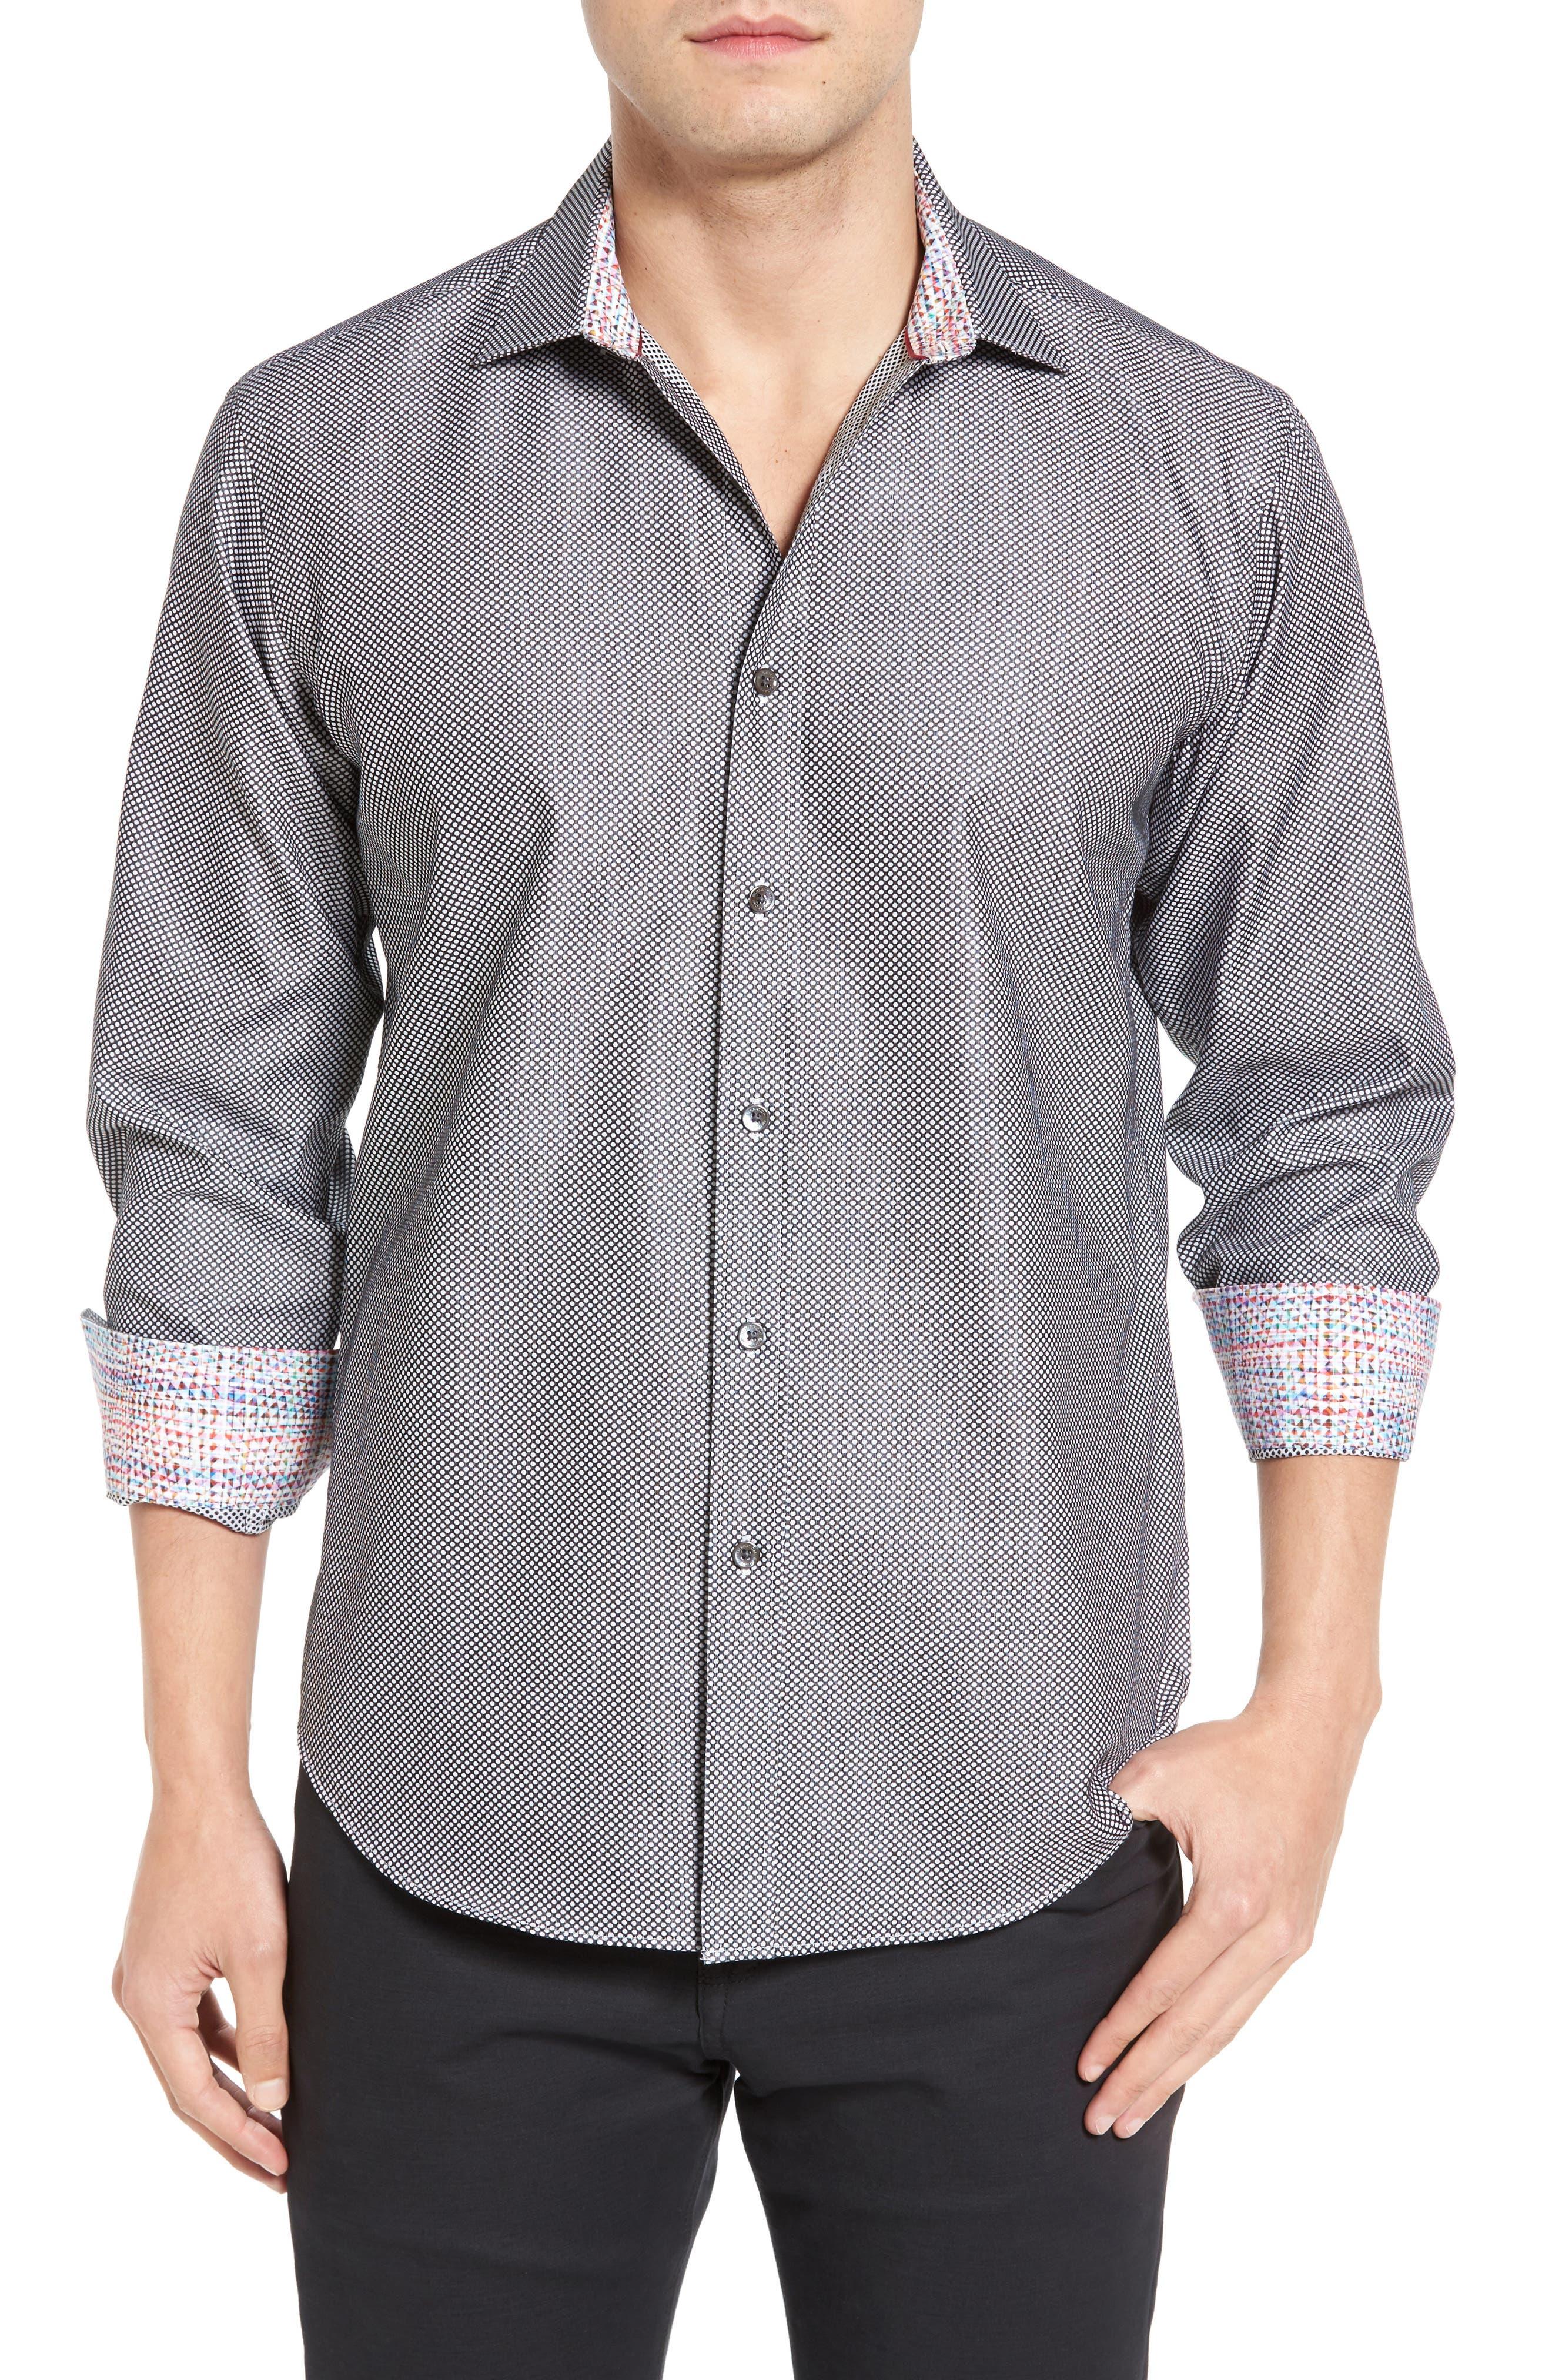 Main Image - Bugatchi Shaped Fit Textured Sport Shirt